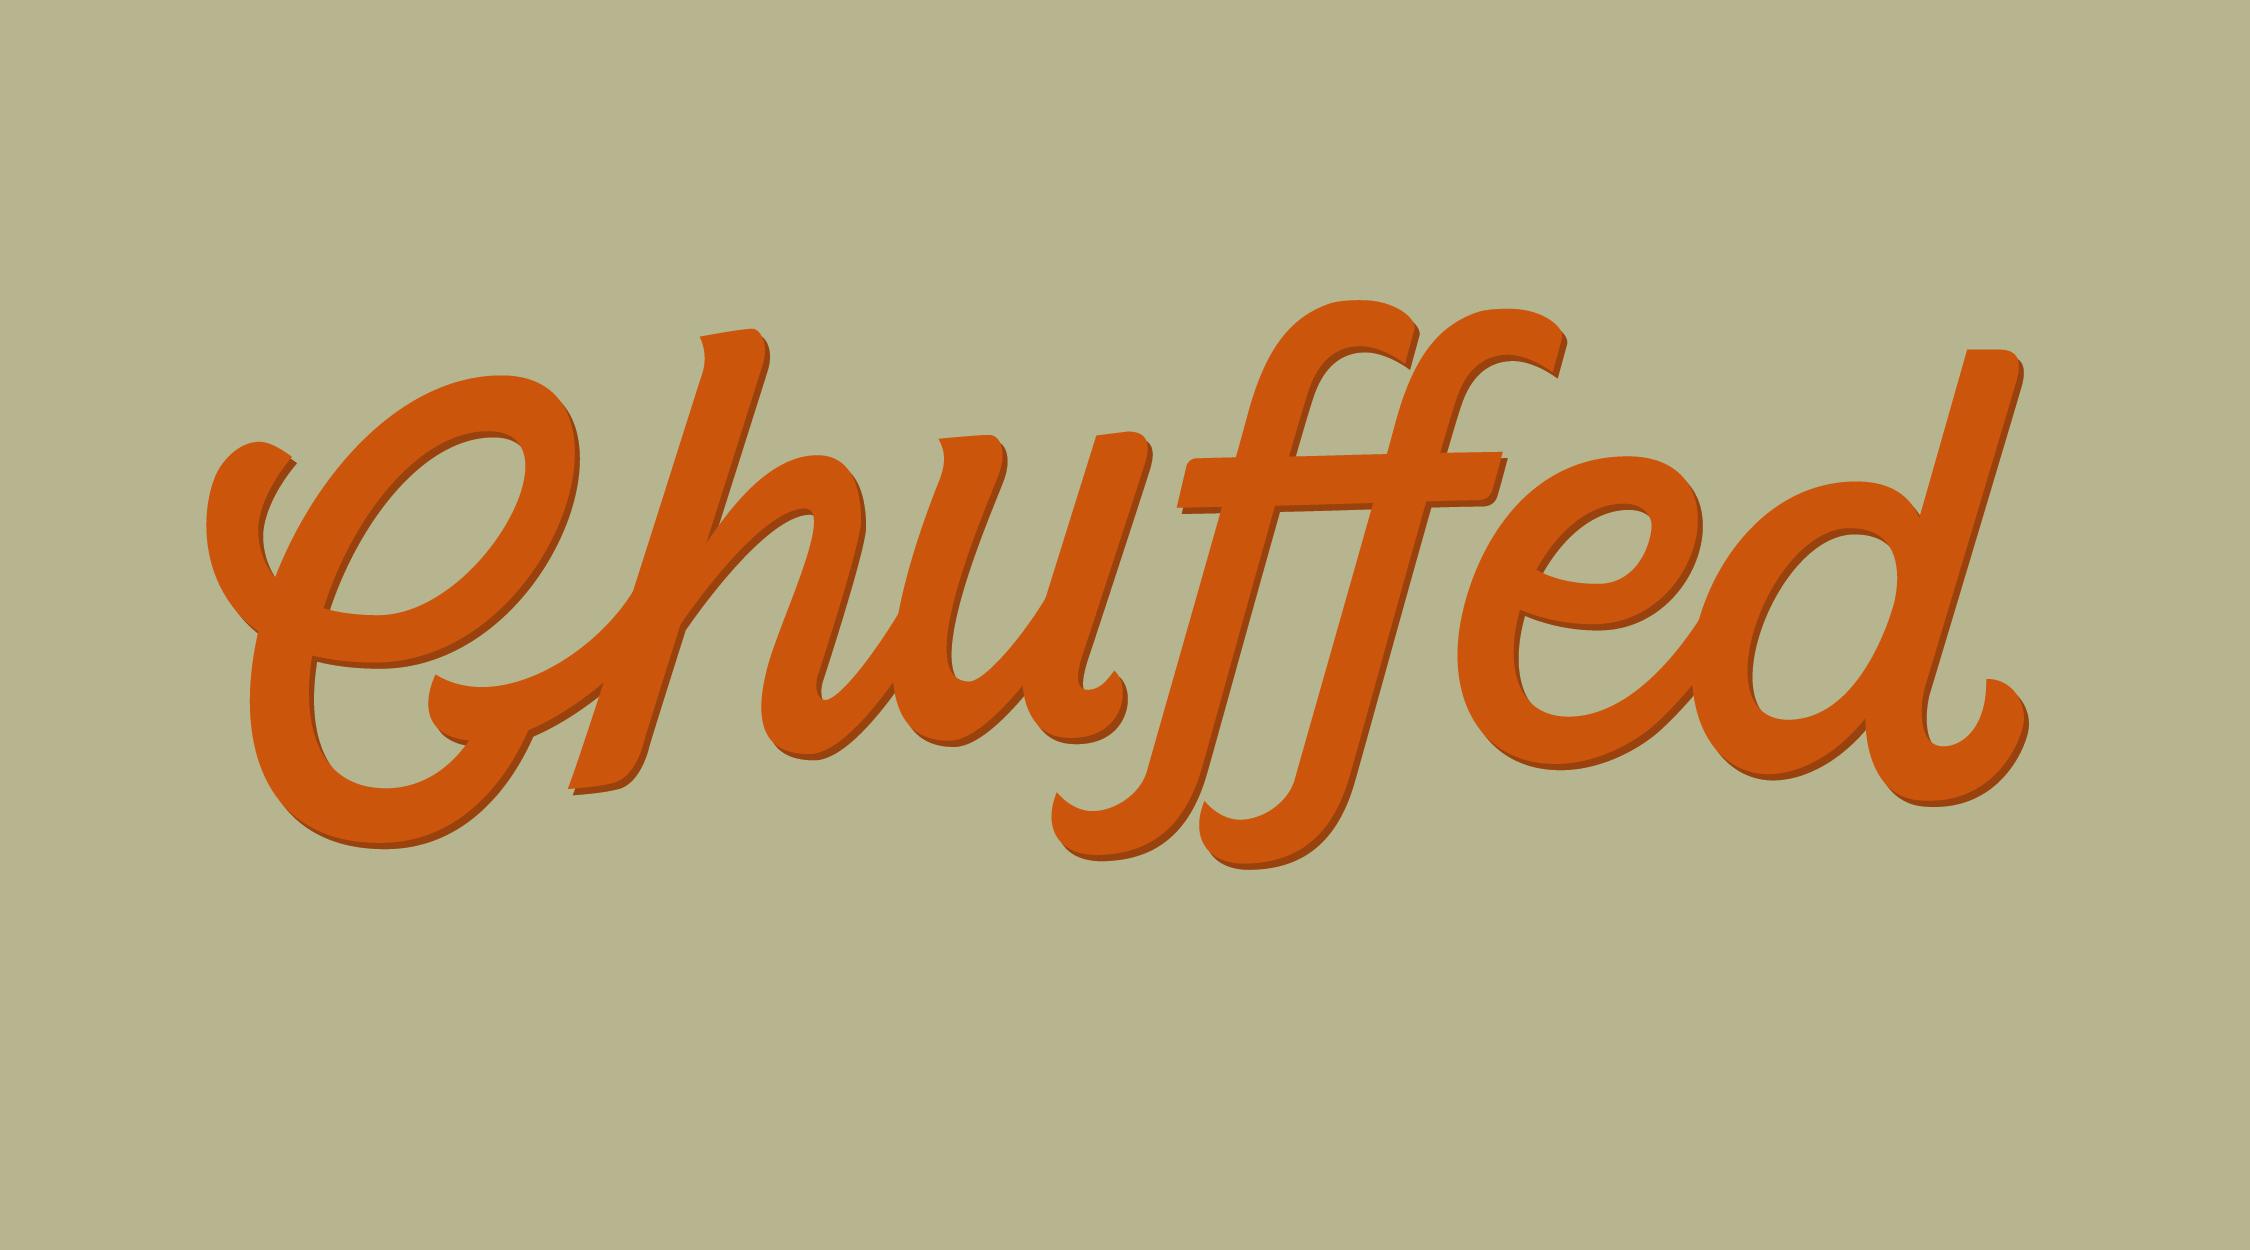 Chuffed wordmark